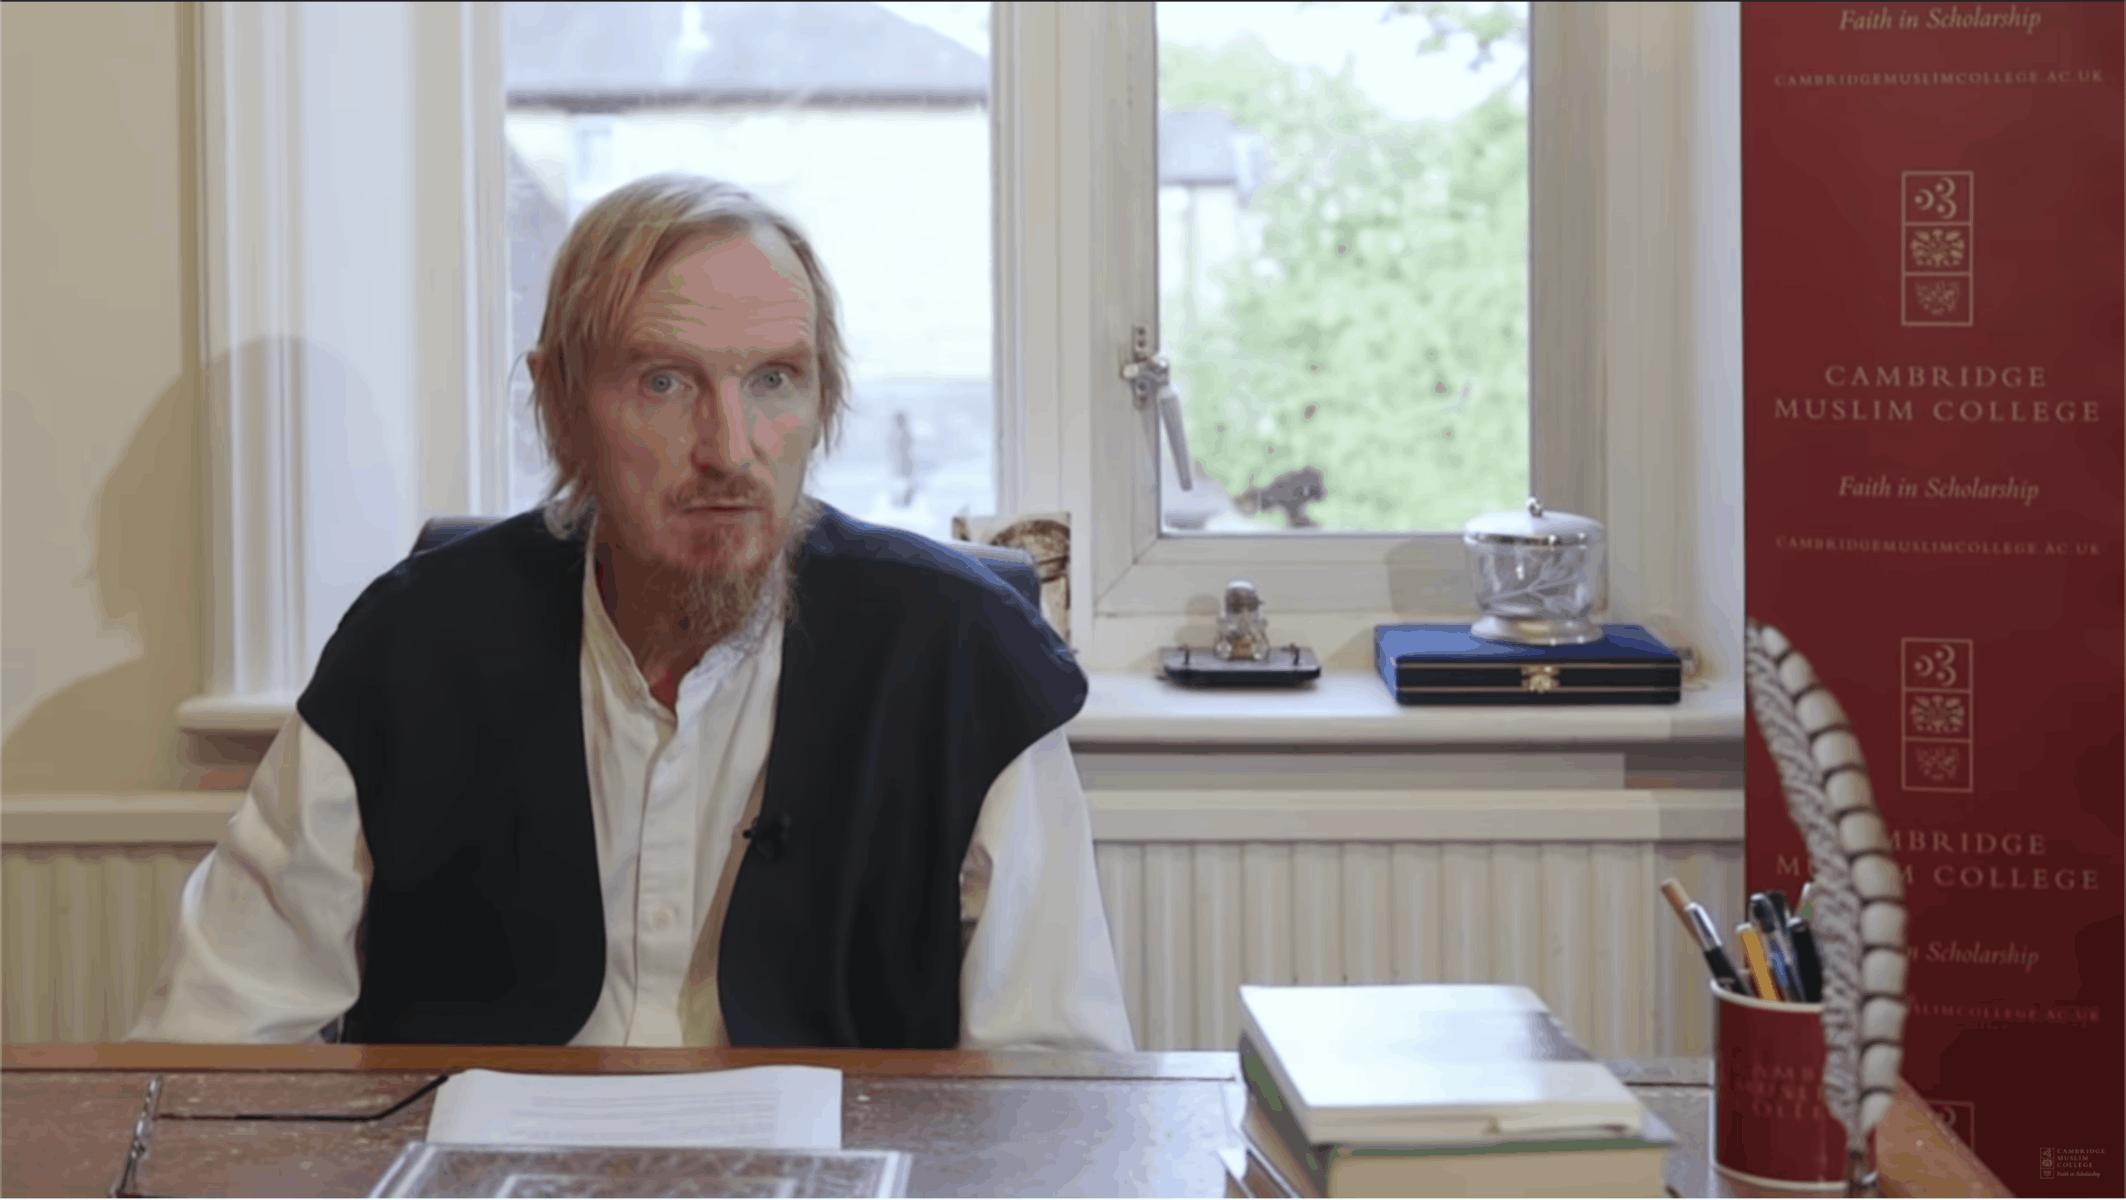 Abdal Hakim Murad – Sacrifice, Wagner & the Eid